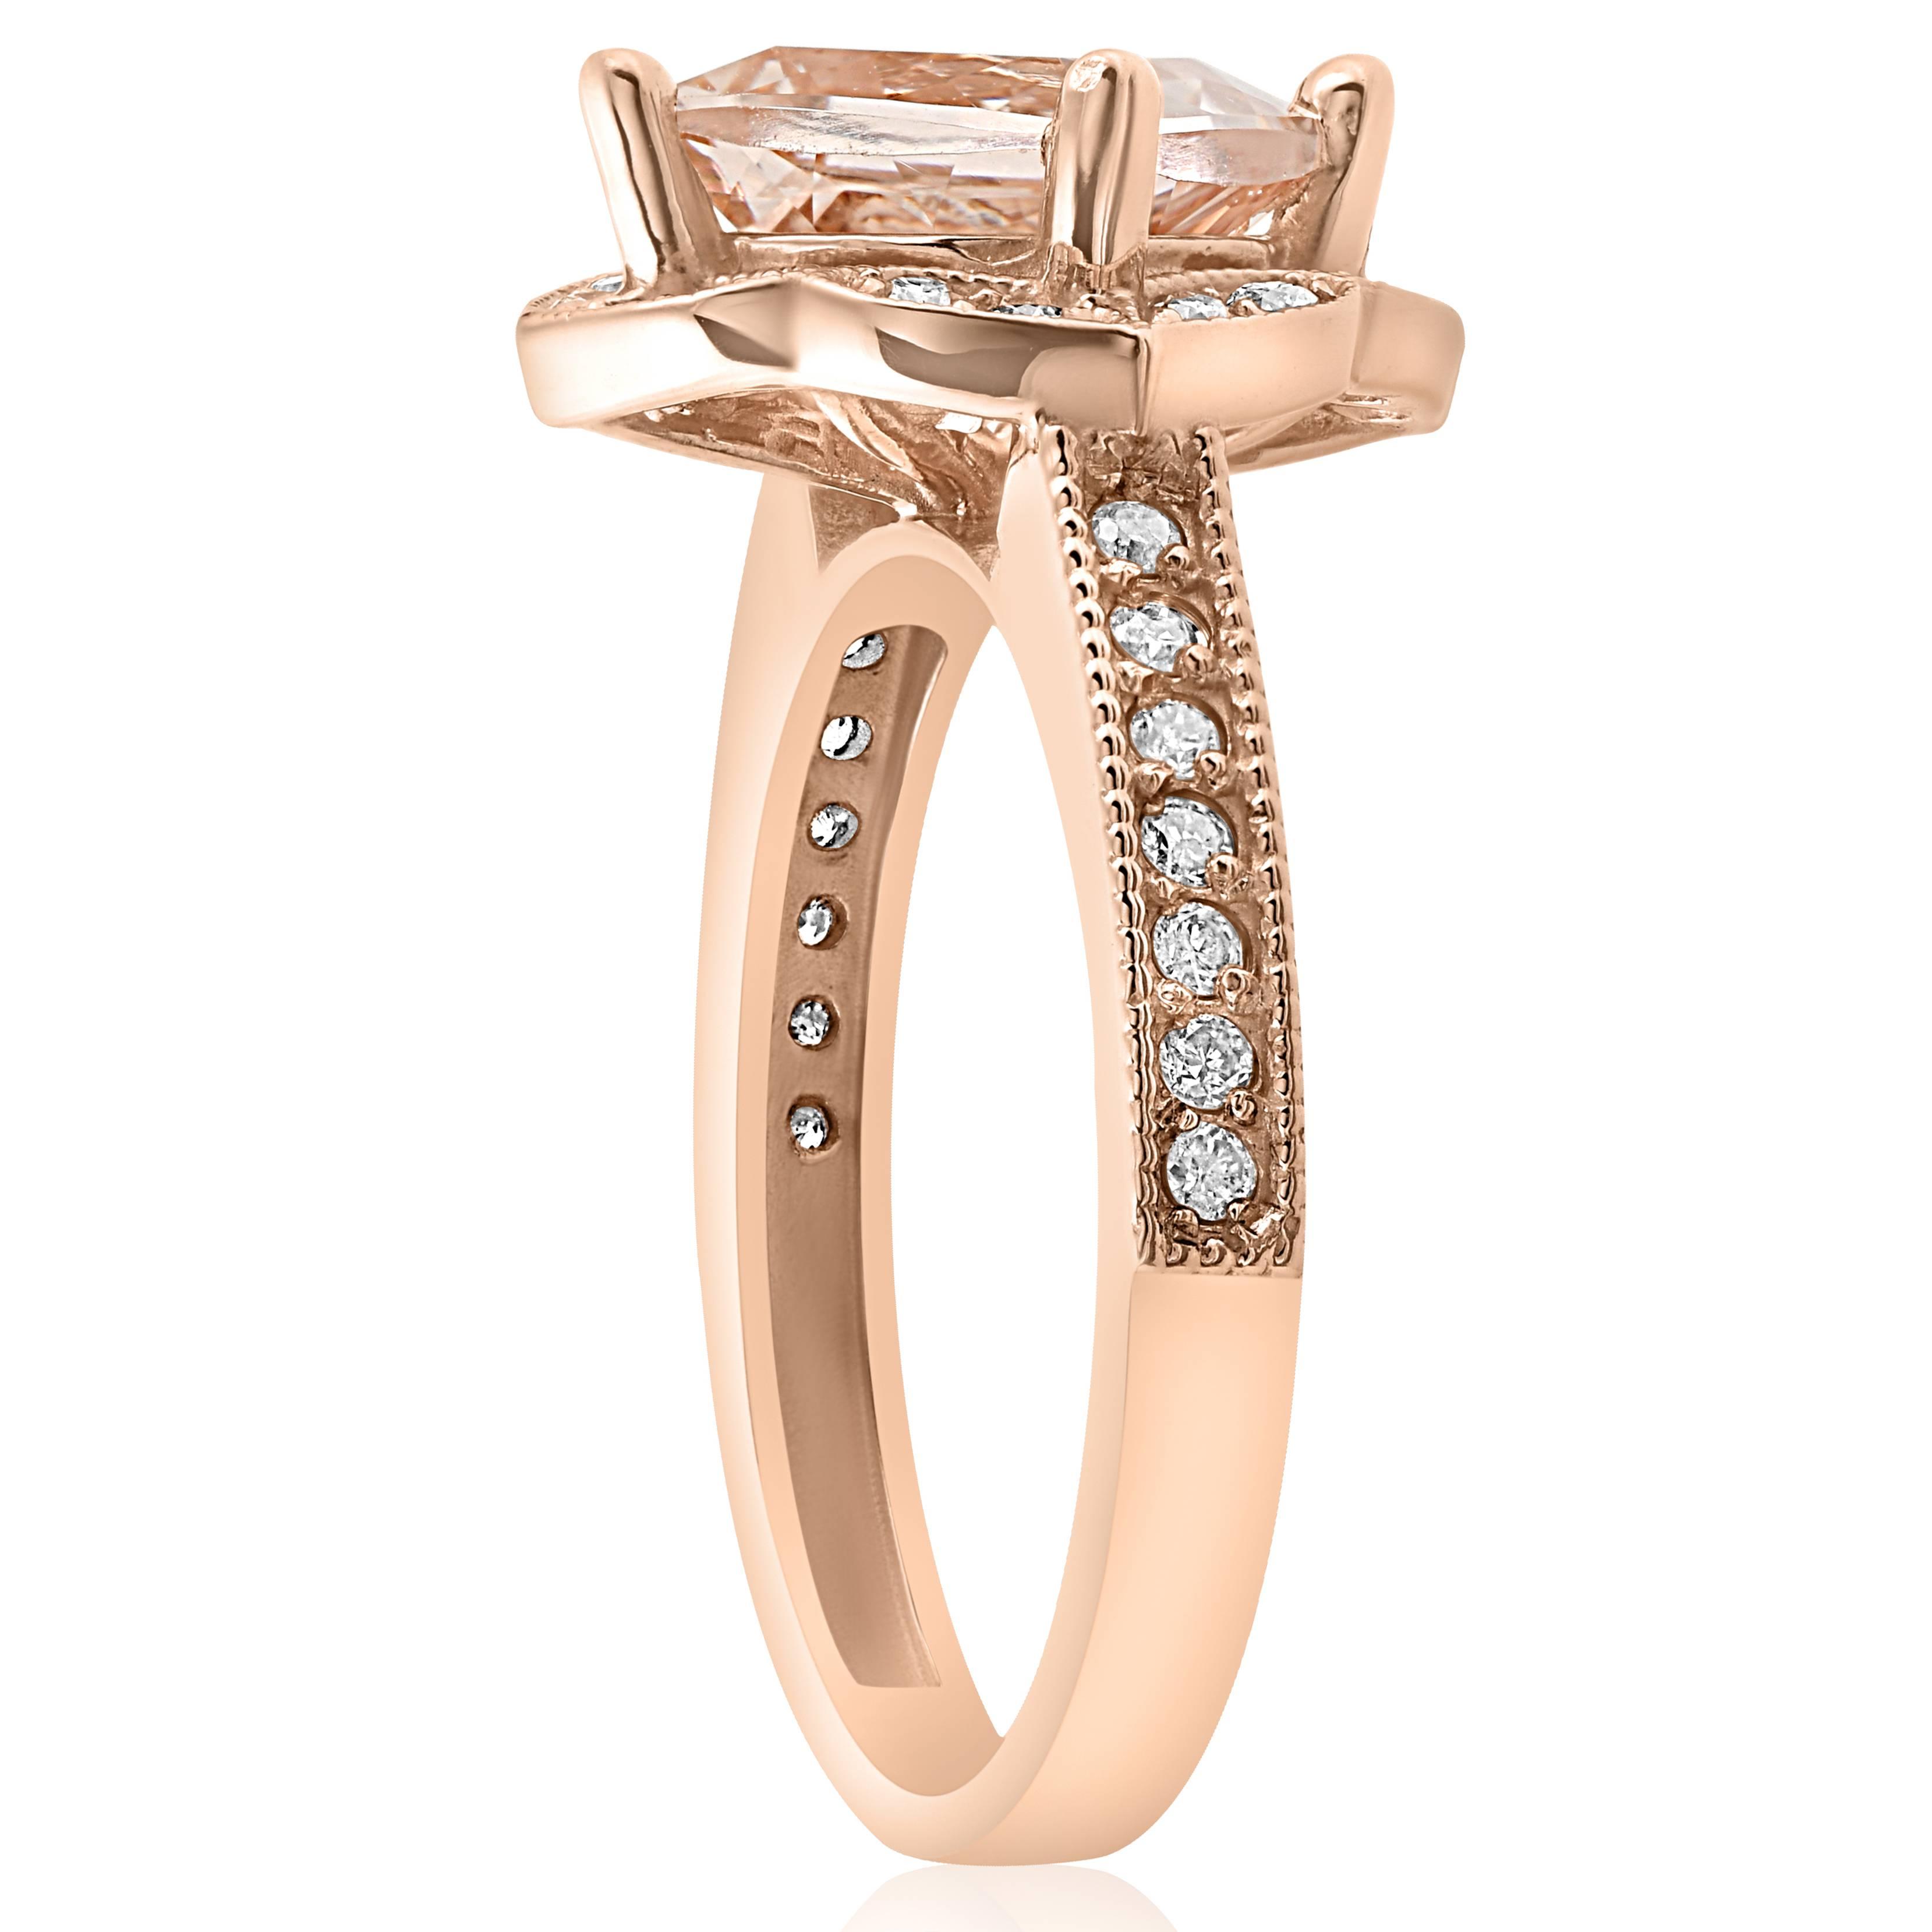 2 1/3ct Cushion Morganite Vintage Diamond Halo Engagement